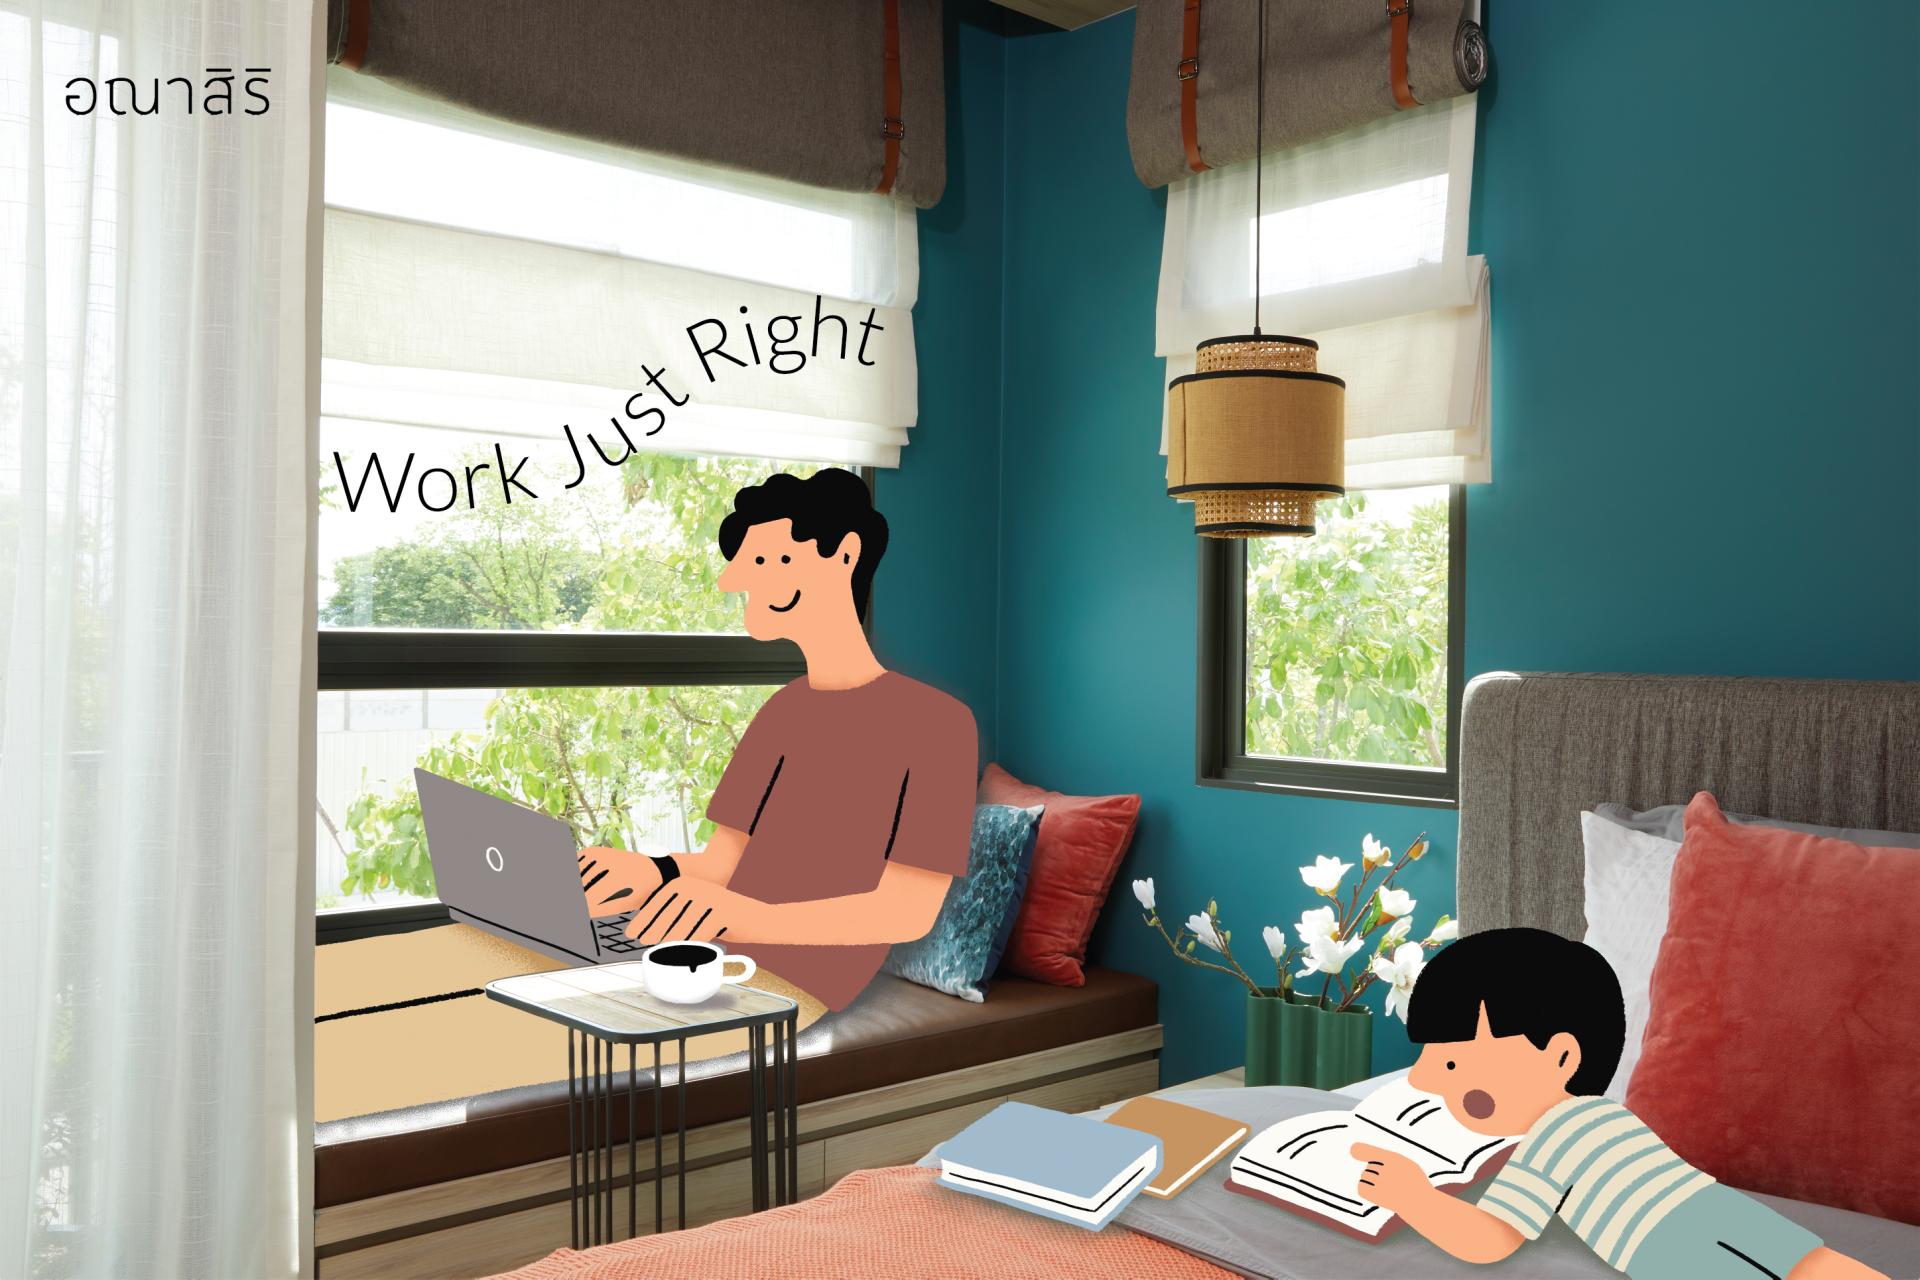 Anasiri_WorkJustRight